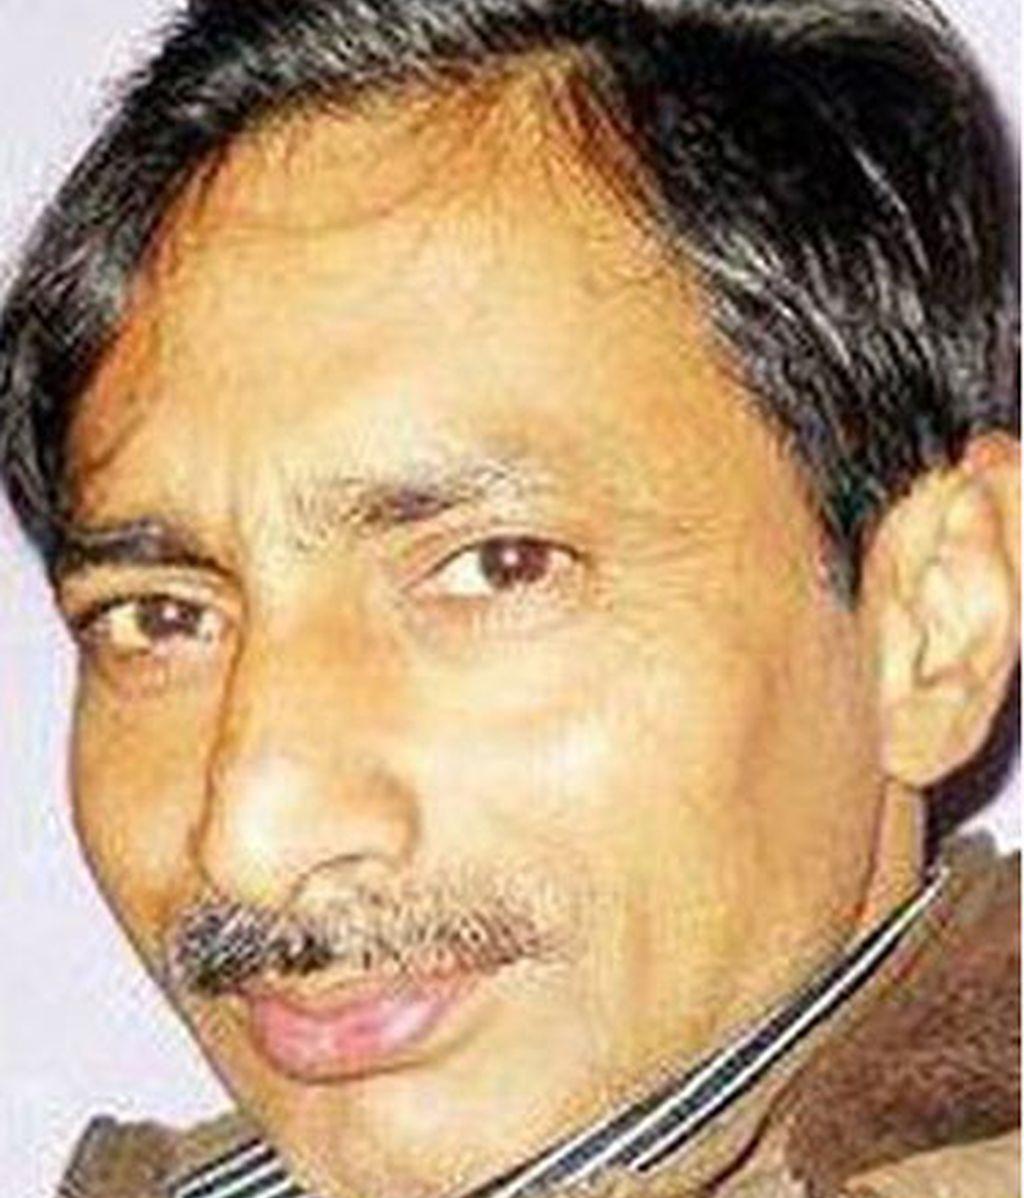 Periodista indio quemado vivo por criticar a un político en Facebook